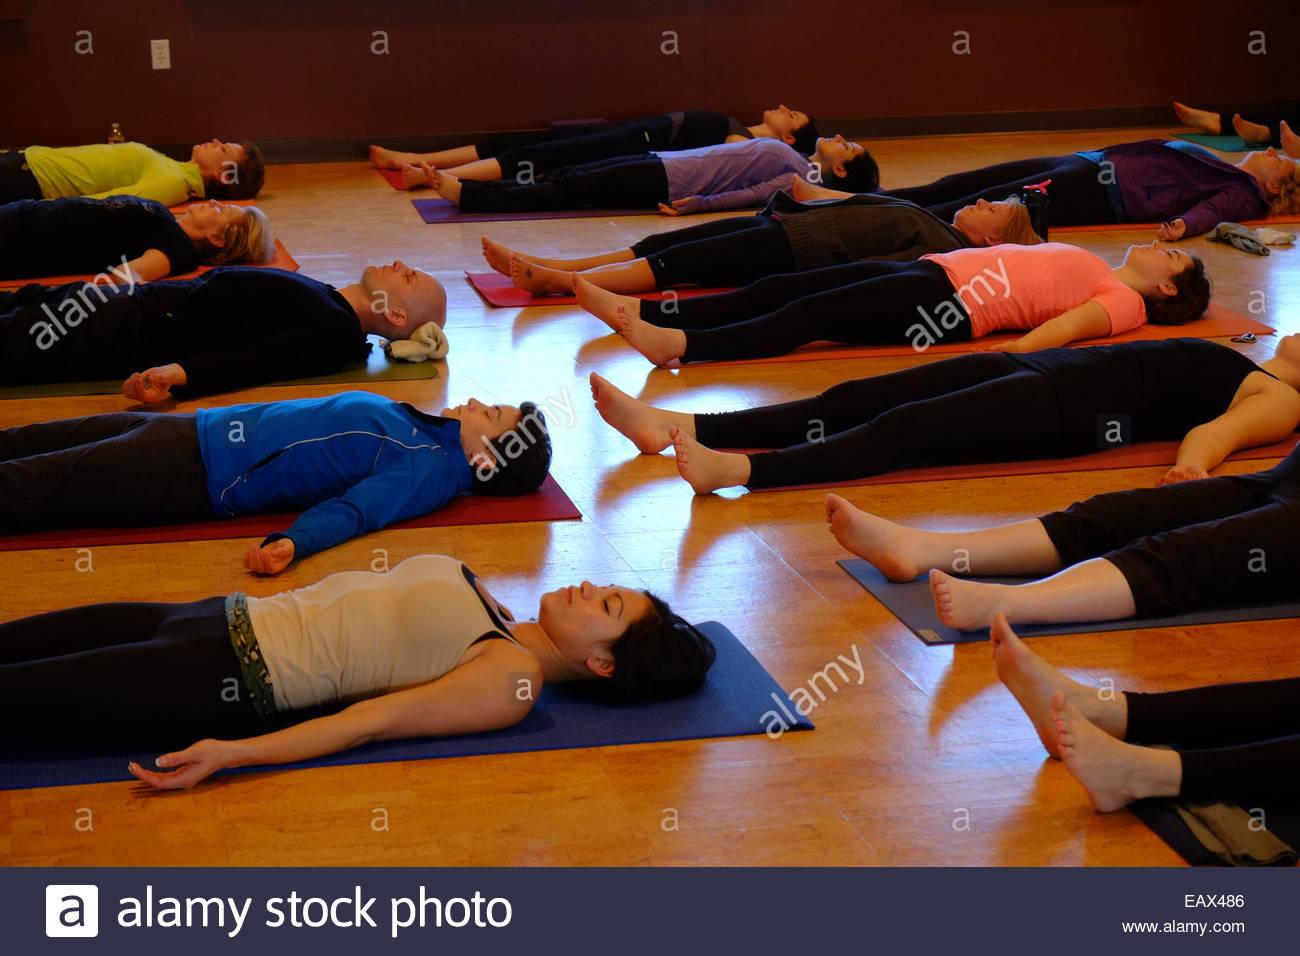 yoga students in savasana or corpse pose stock photo 75562150 alamy